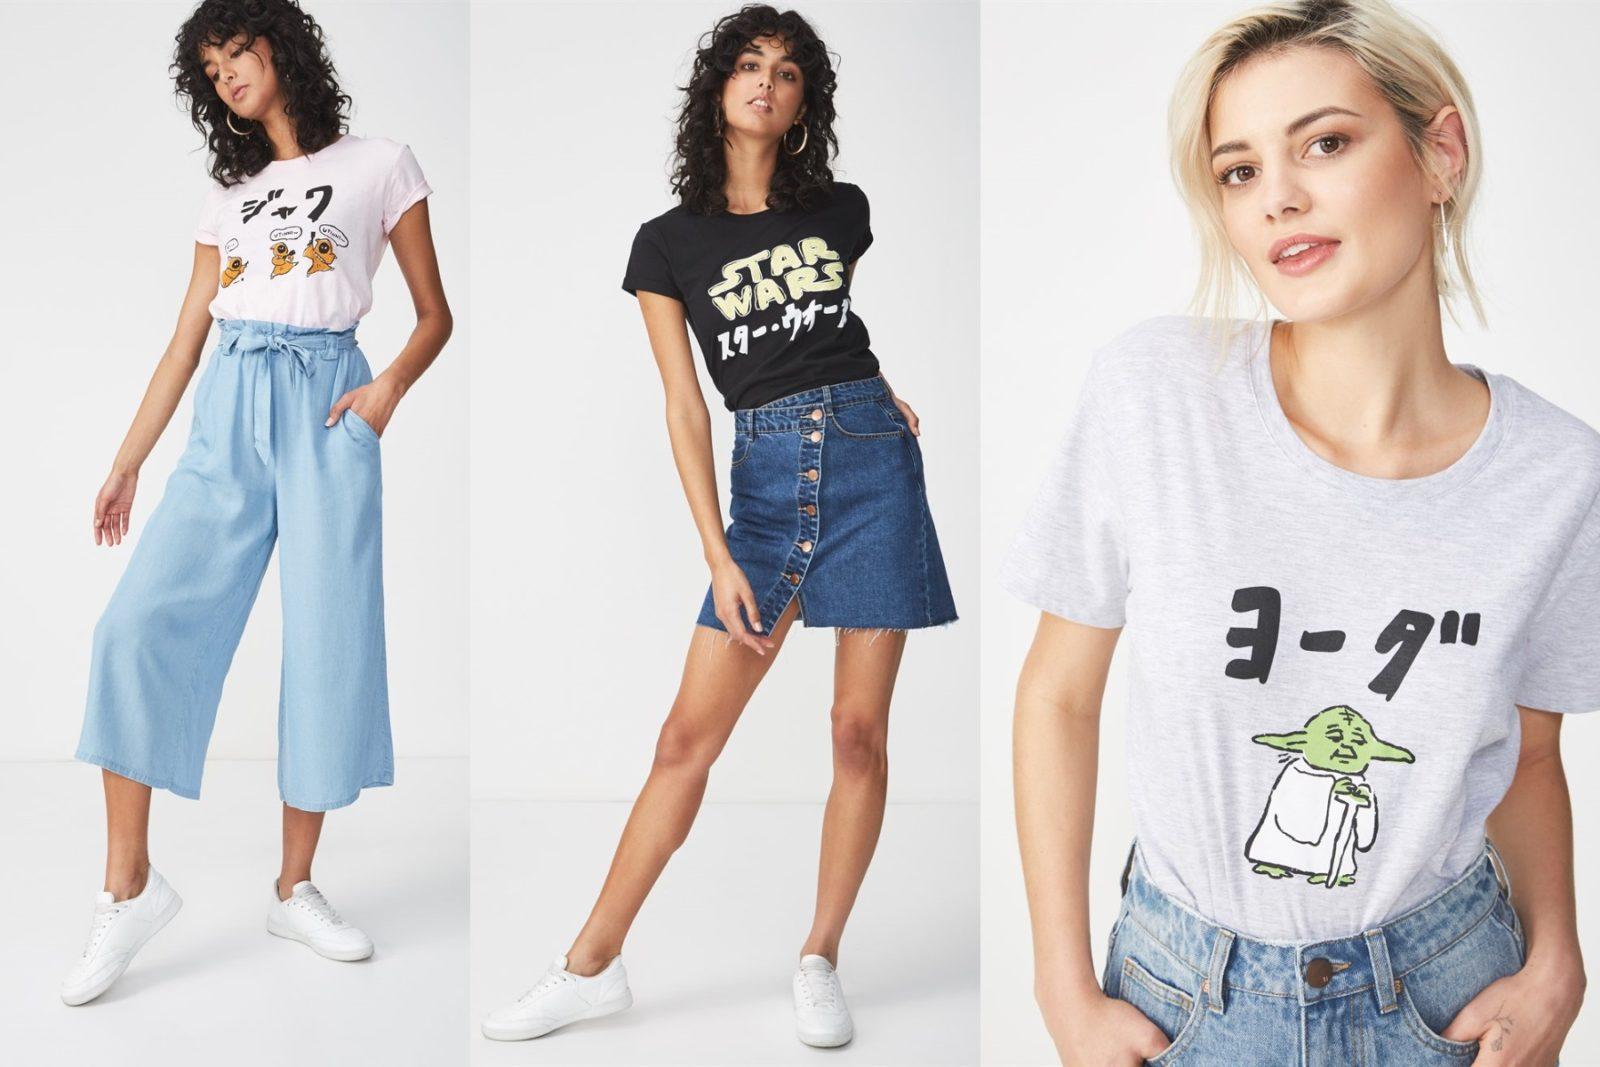 New Star Wars T-Shirts at Cotton On AUS & NZ